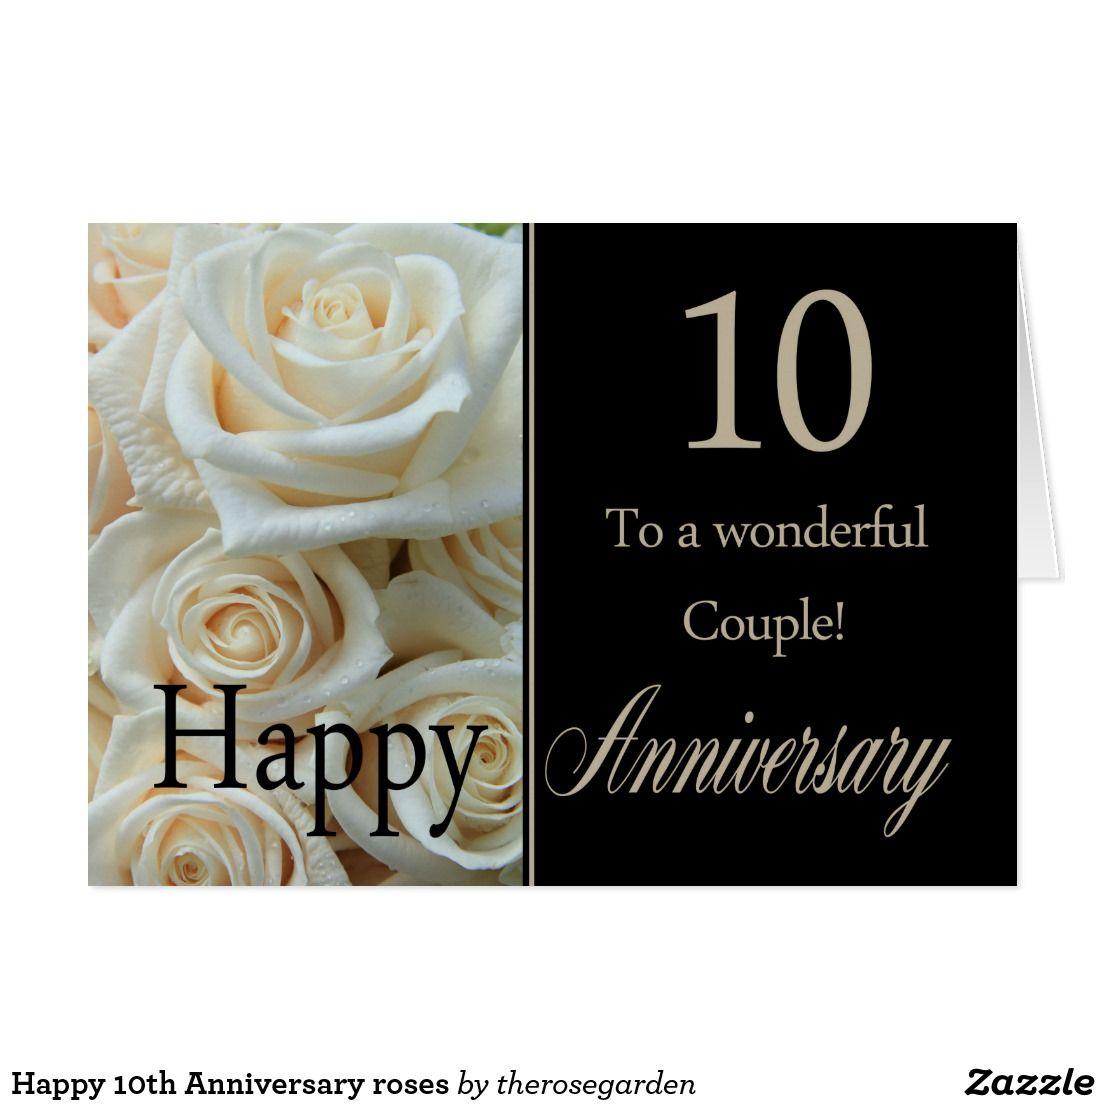 Happy 10th Anniversary Roses Card Zazzle Com Anniversary Cards For Husband 50th Anniversary Cards 20th Anniversary Cards